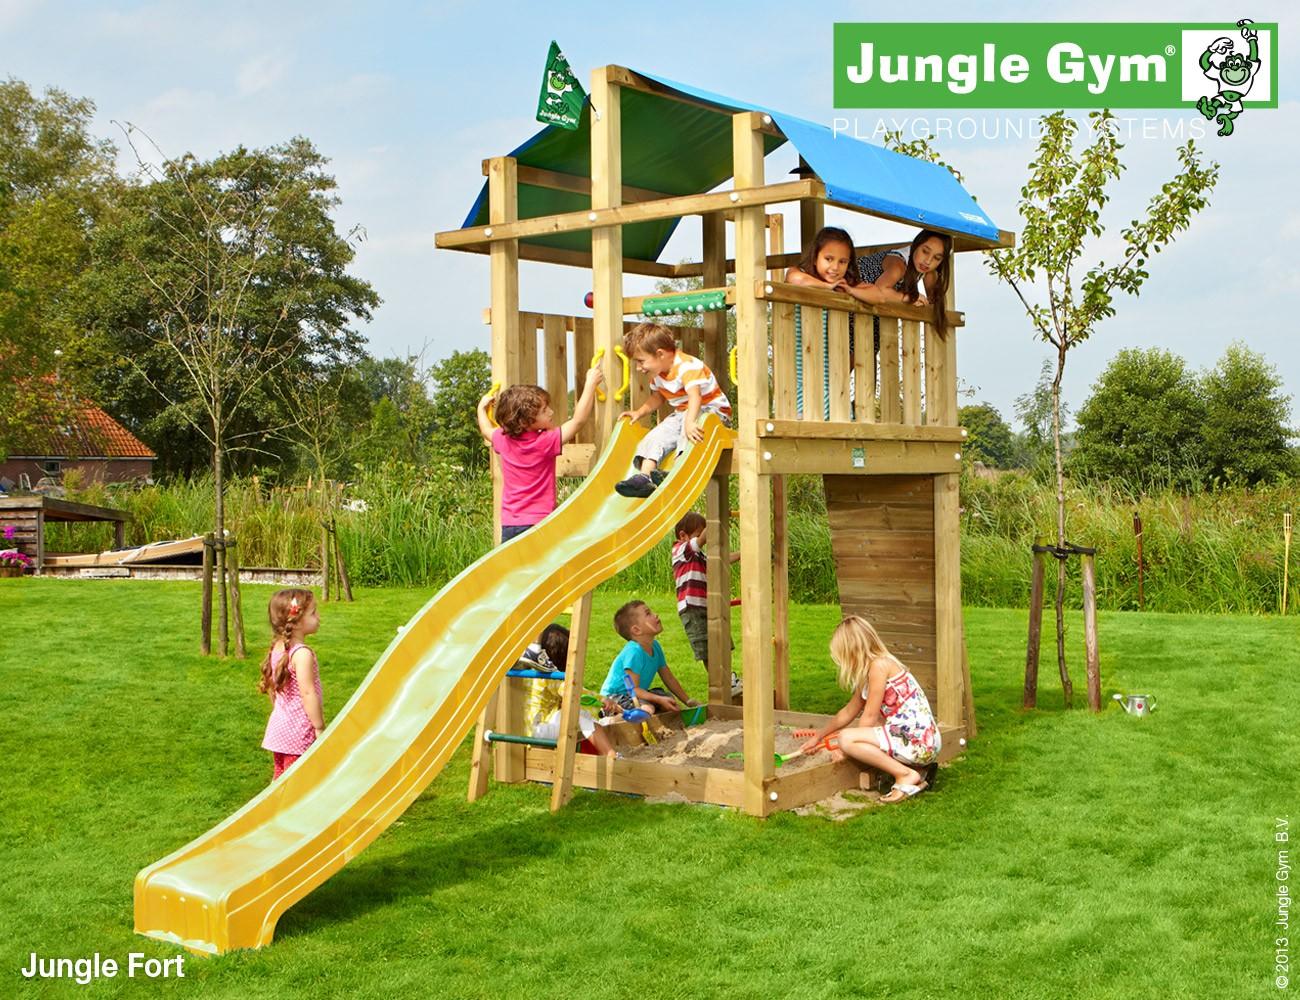 Full Size of Jungle Fort Spielturm Garten Bauhaus Fenster Kinderspielturm Wohnzimmer Spielturm Bauhaus